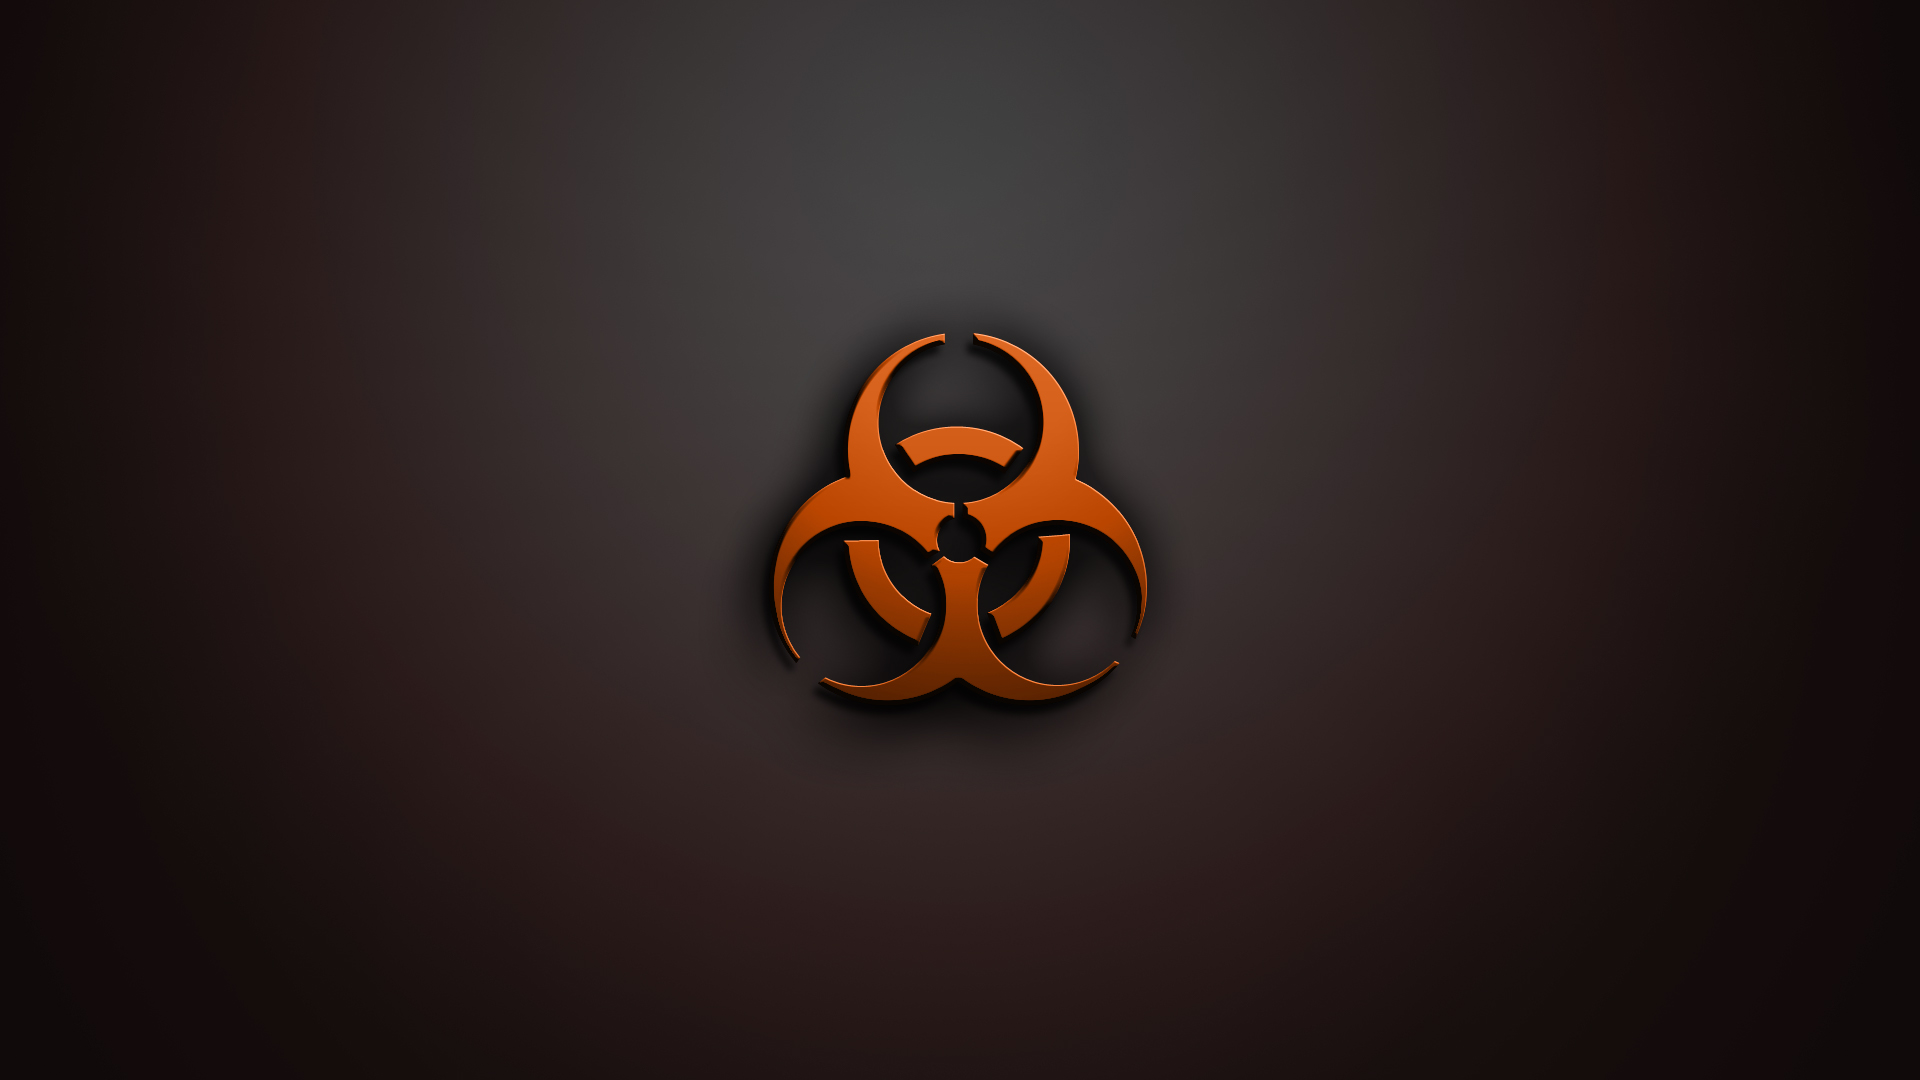 Zombie Biohazard Symbol Wallpaper galleryhipcom   The 1920x1080